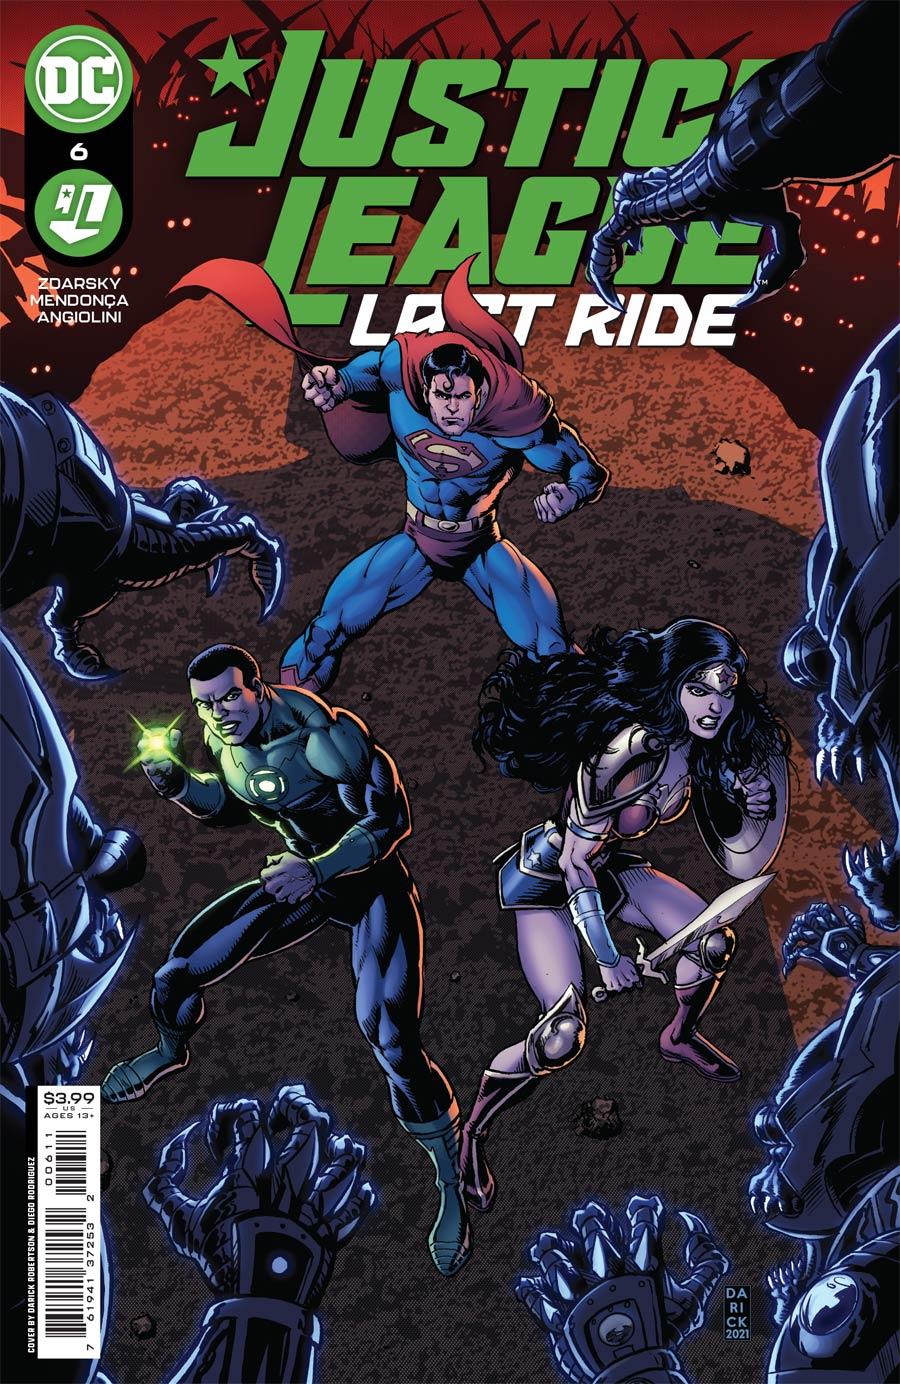 Justice League Last Ride #6 Cover A Regular Darick Robertson Cover